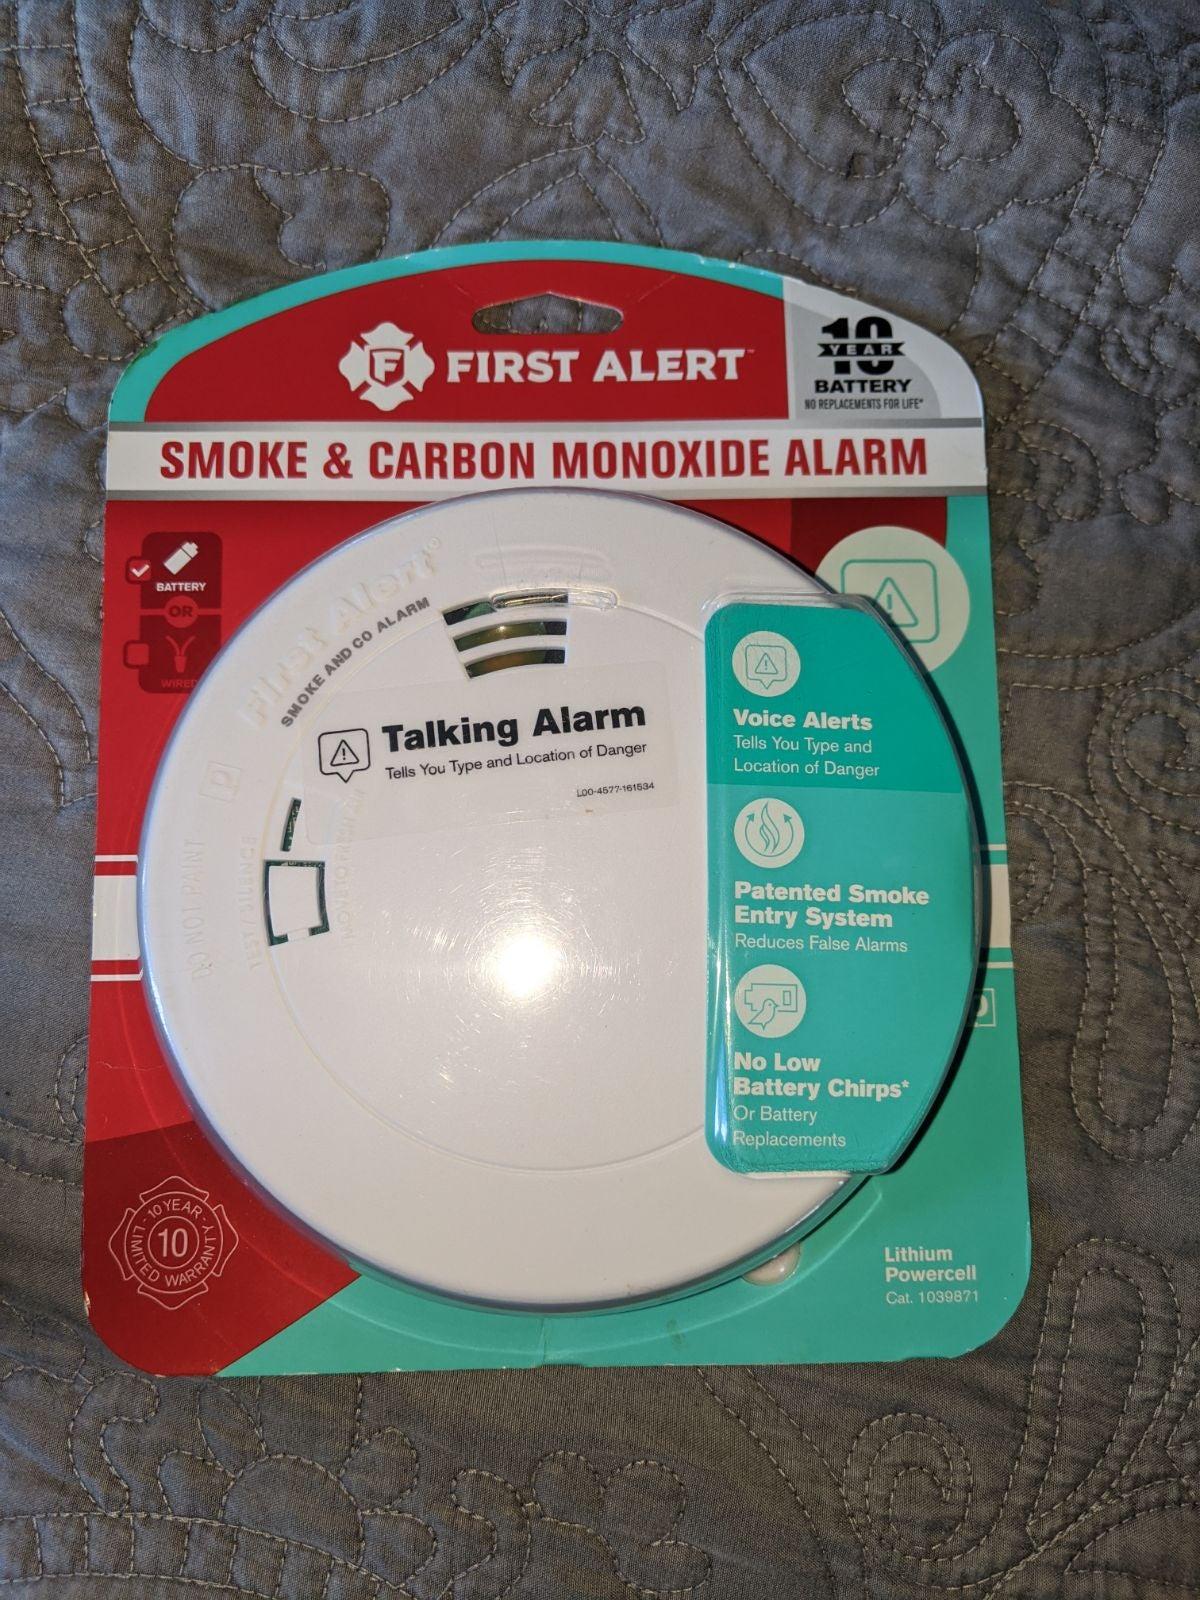 First alert smoke and carbon monoxide de